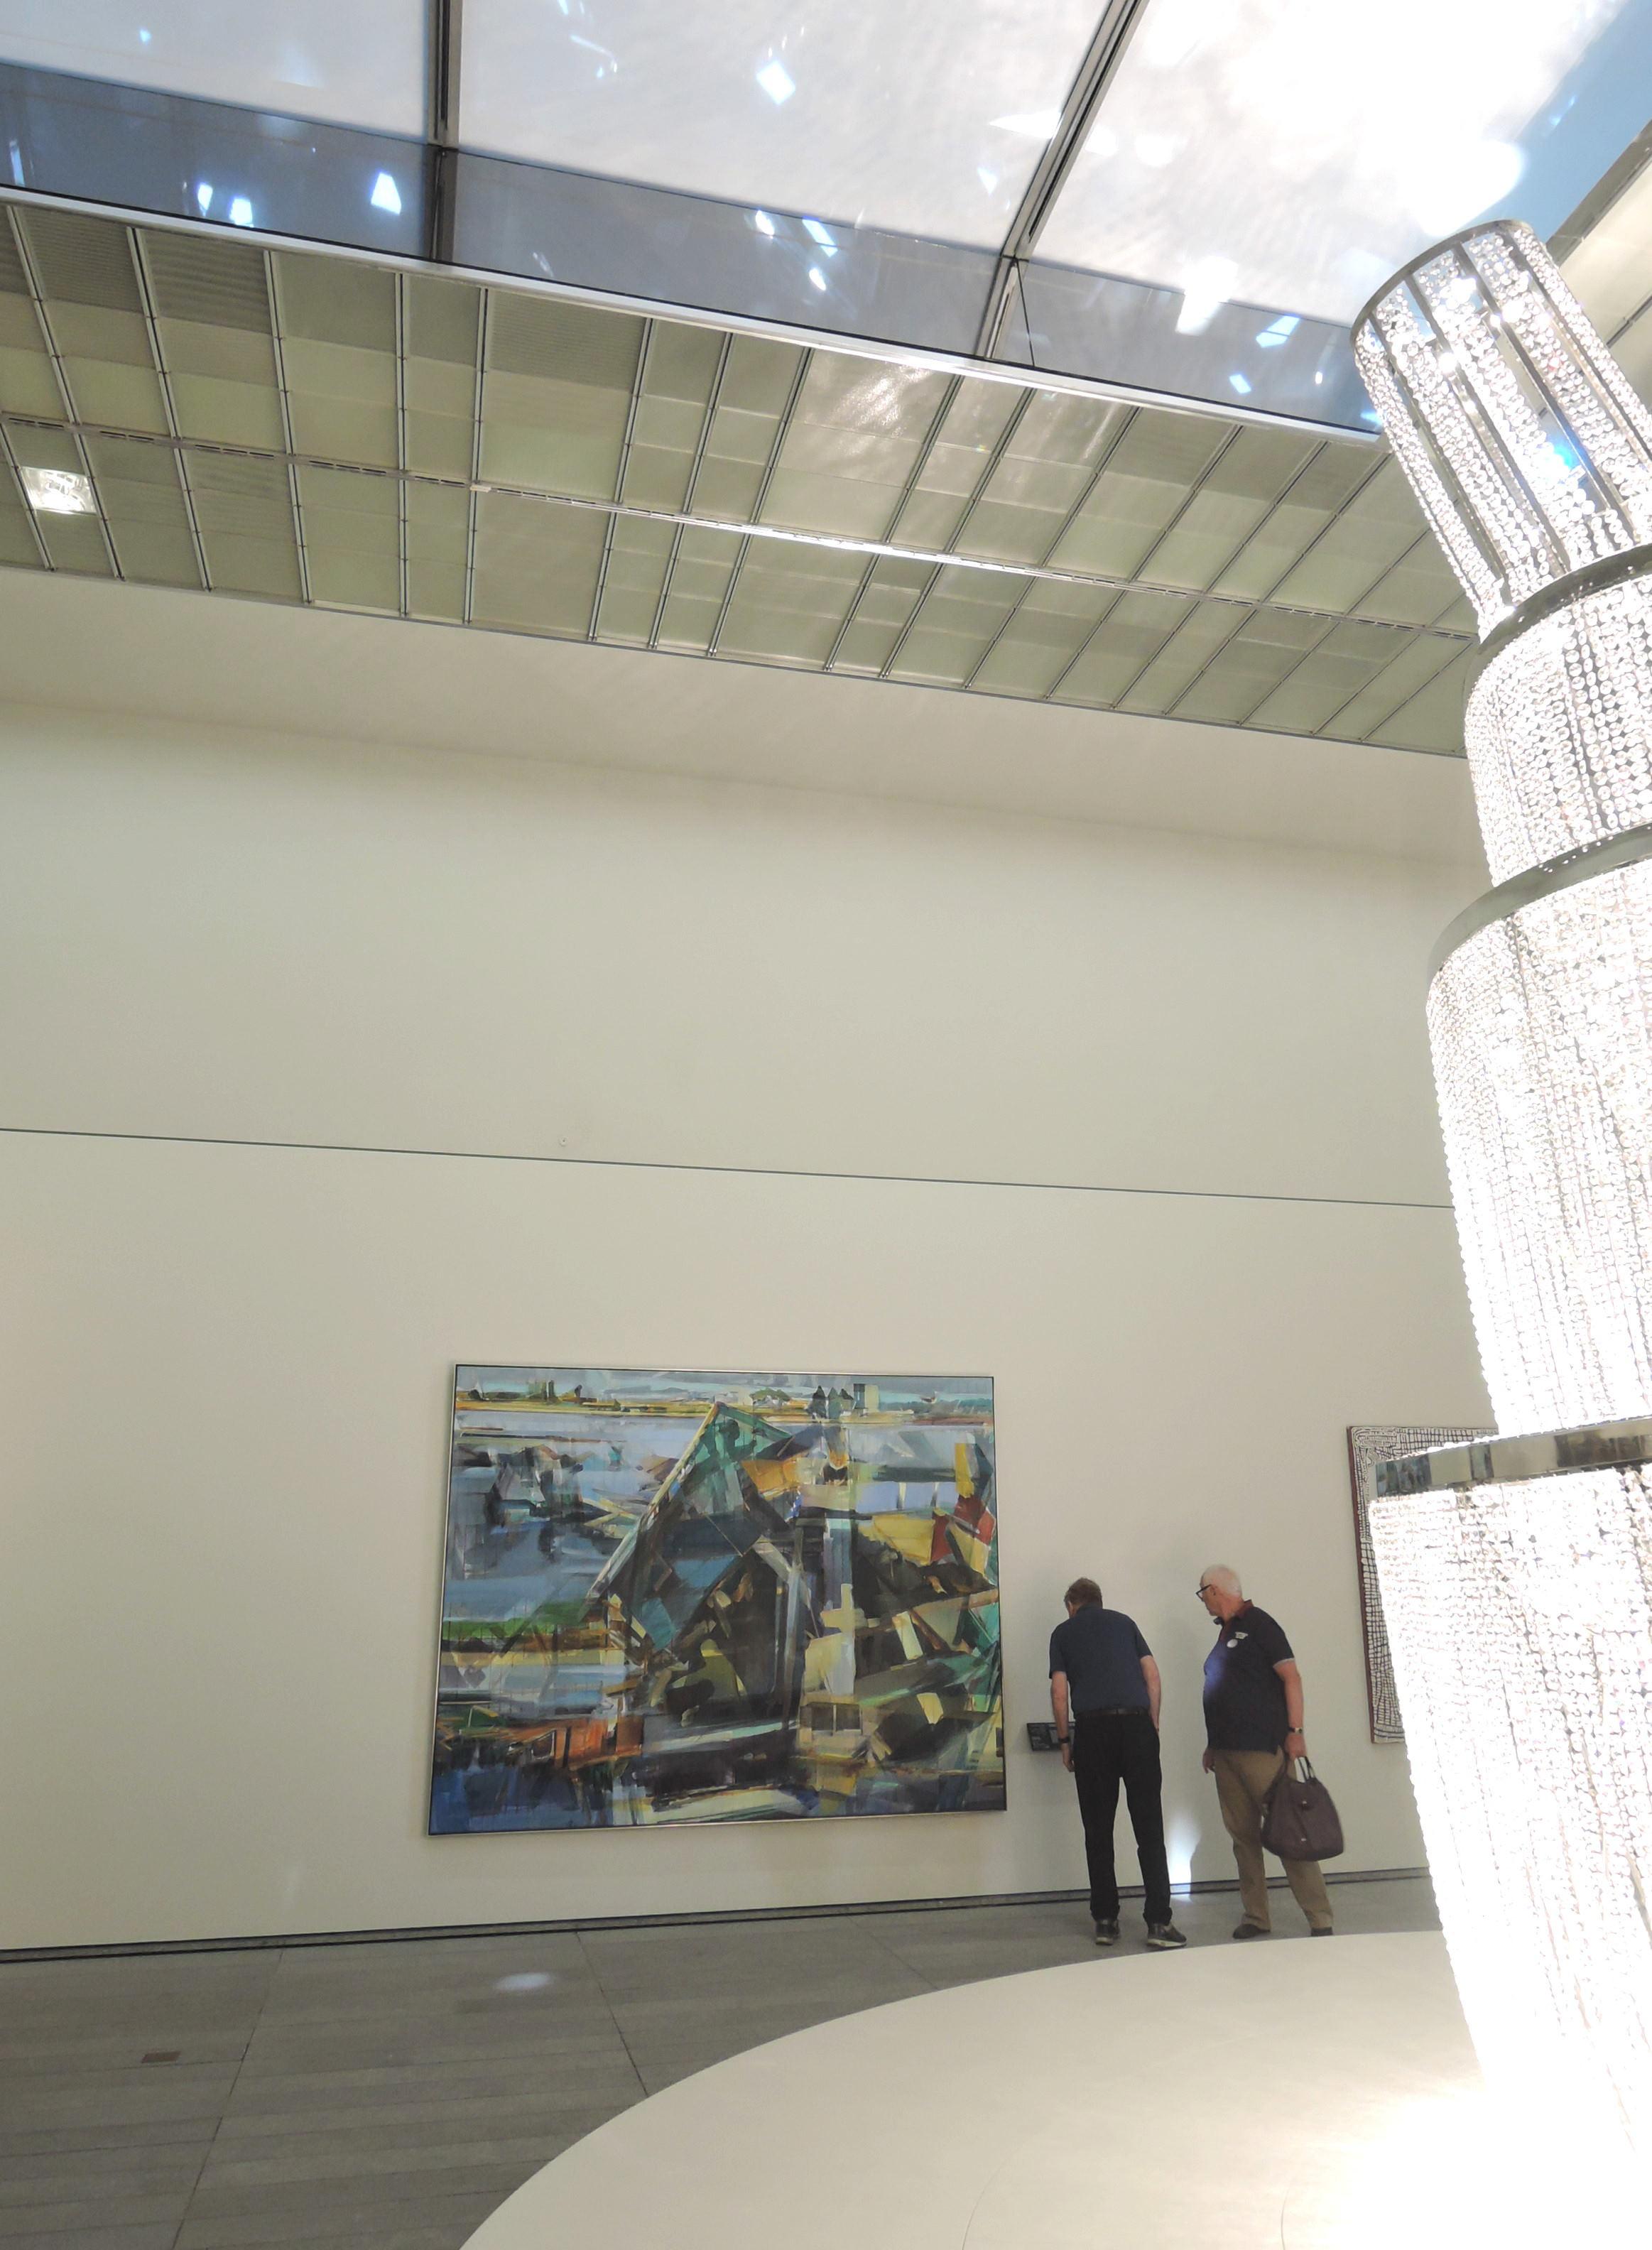 Une scène globale  , Louvre Abu Dhabi, November 2017, curator Juliette Singer. Artists in view Zang Huan, Mounir Fatmi, Omar Ba, Duncan Wylie, Ai Wei Wei